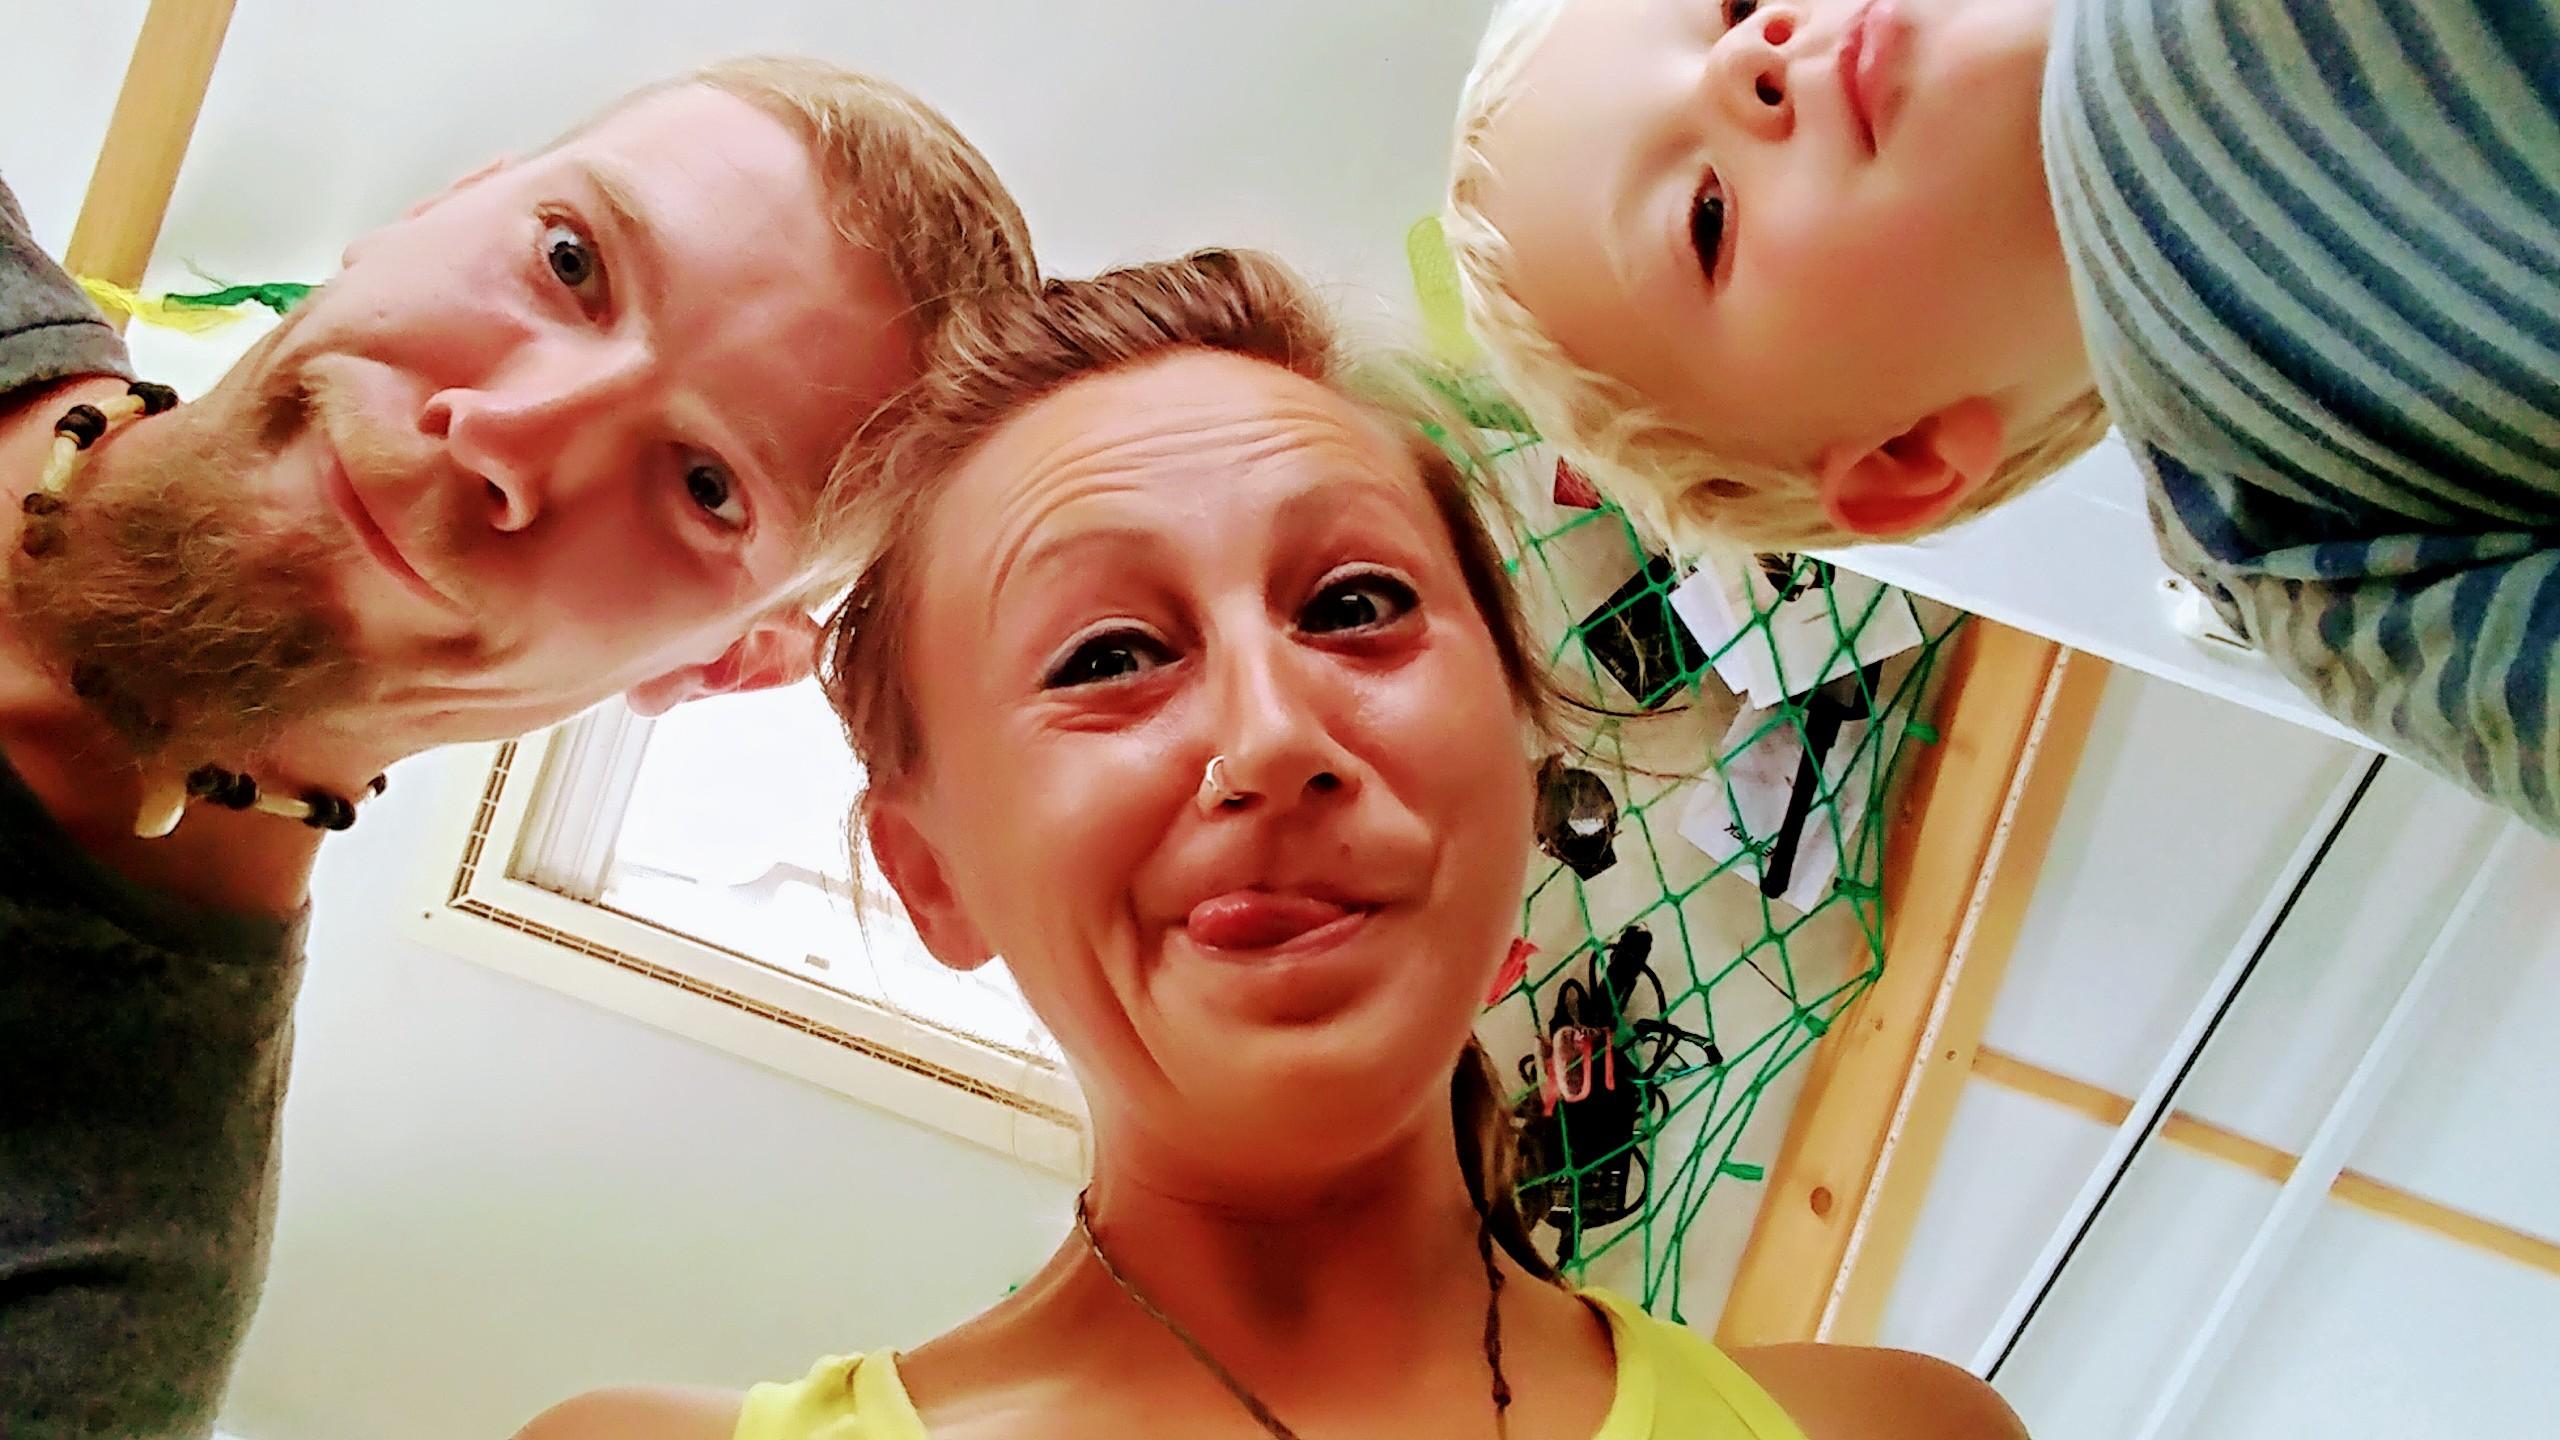 Drei verrückte ReiseRitter